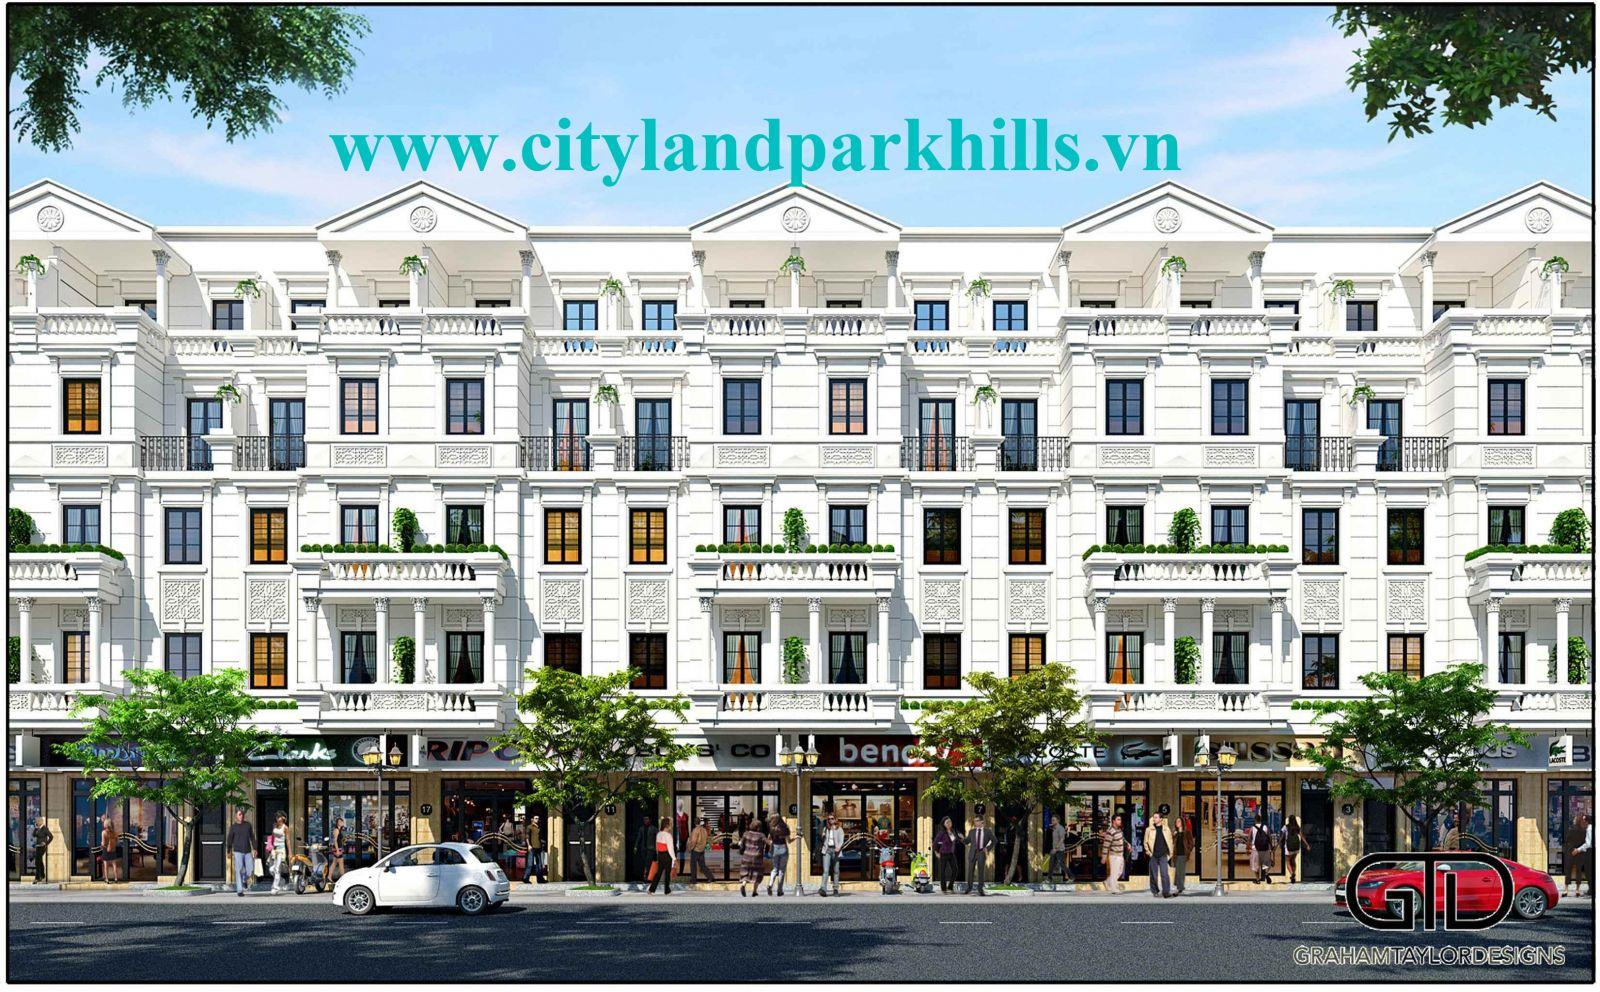 Cityland Park Hills